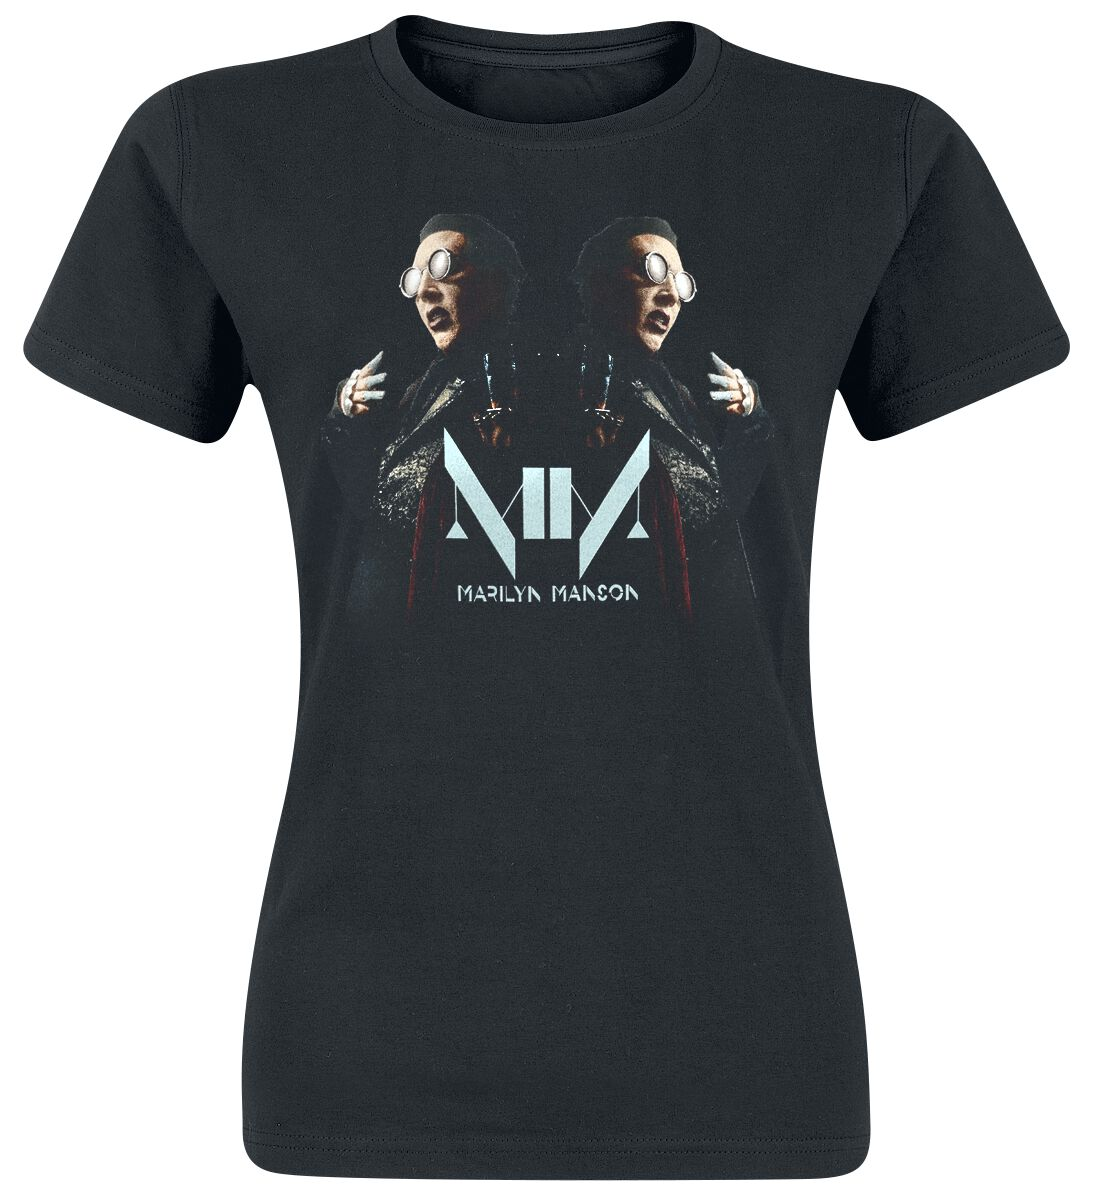 Zespoły - Koszulki - Koszulka damska Marilyn Manson Double Vision Koszulka damska czarny - 368641